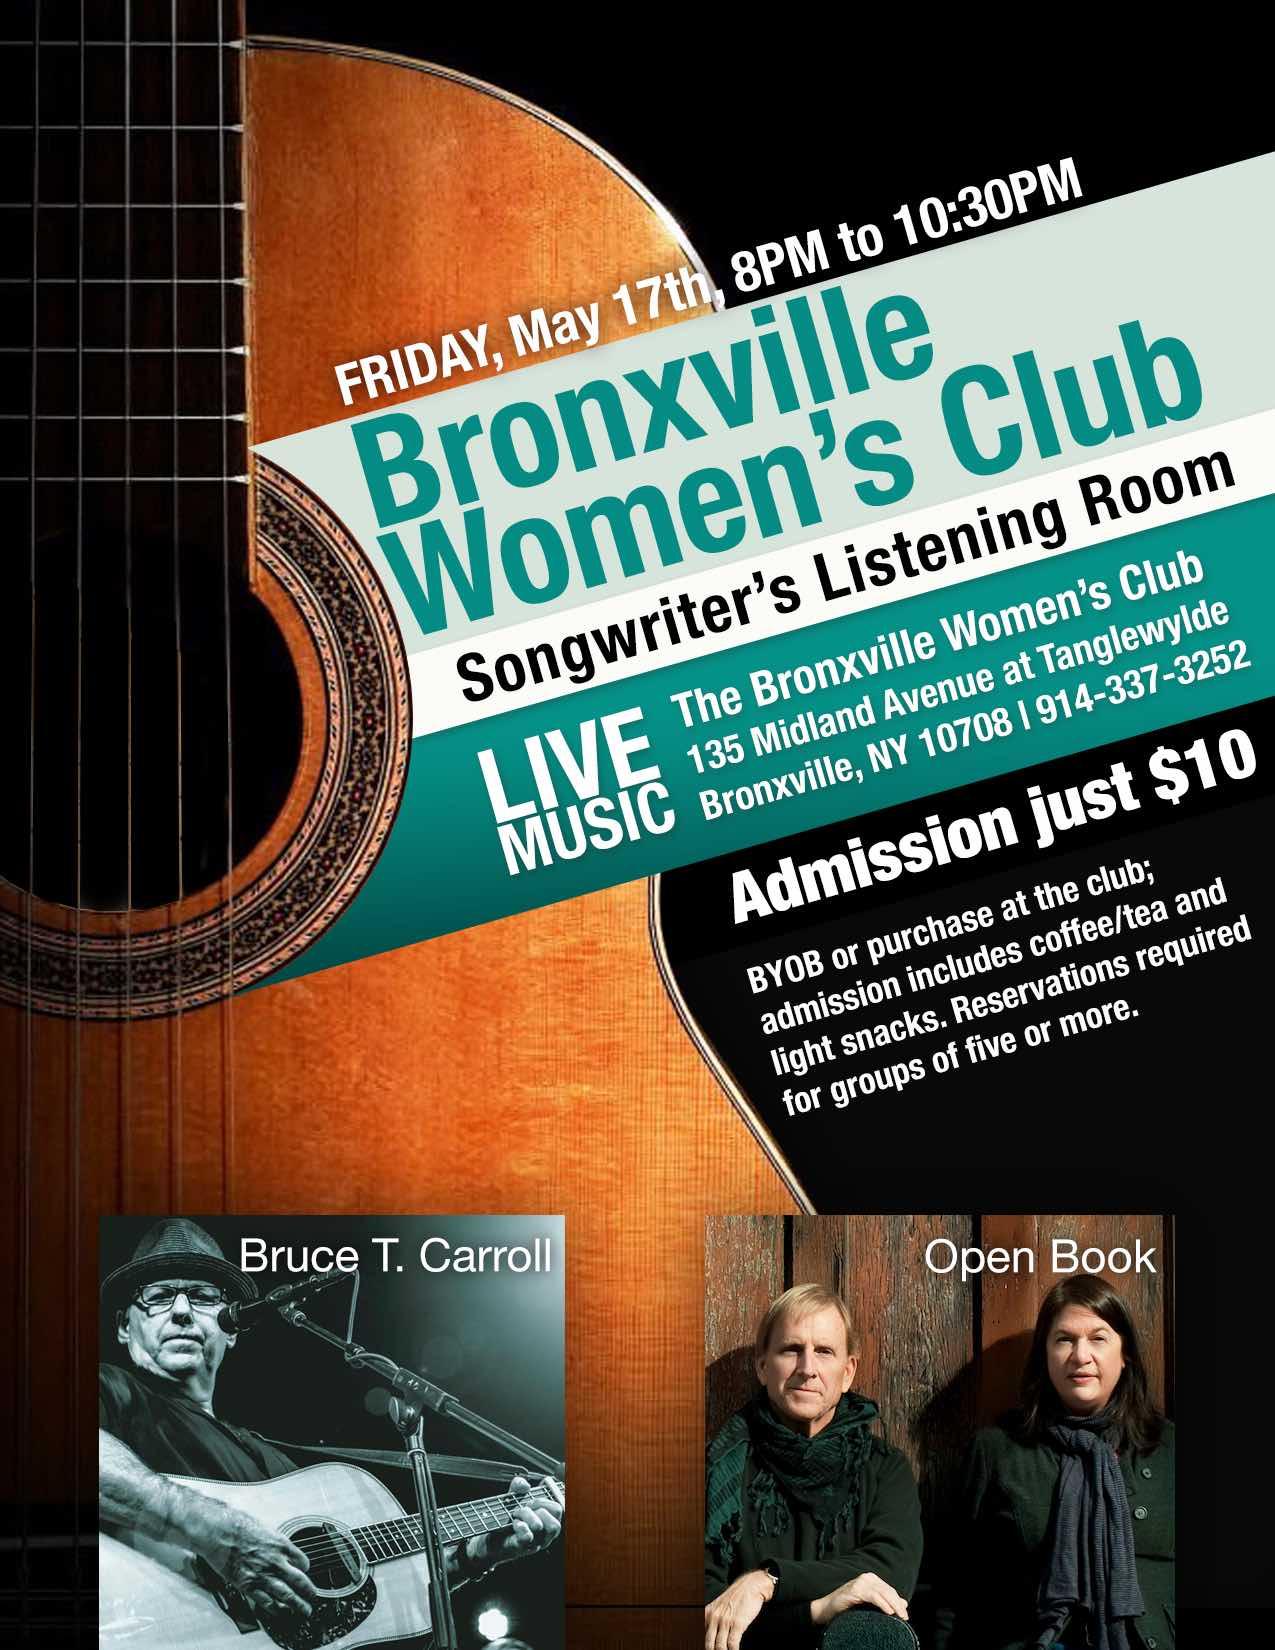 BWC_poster_5-17-19.jpg